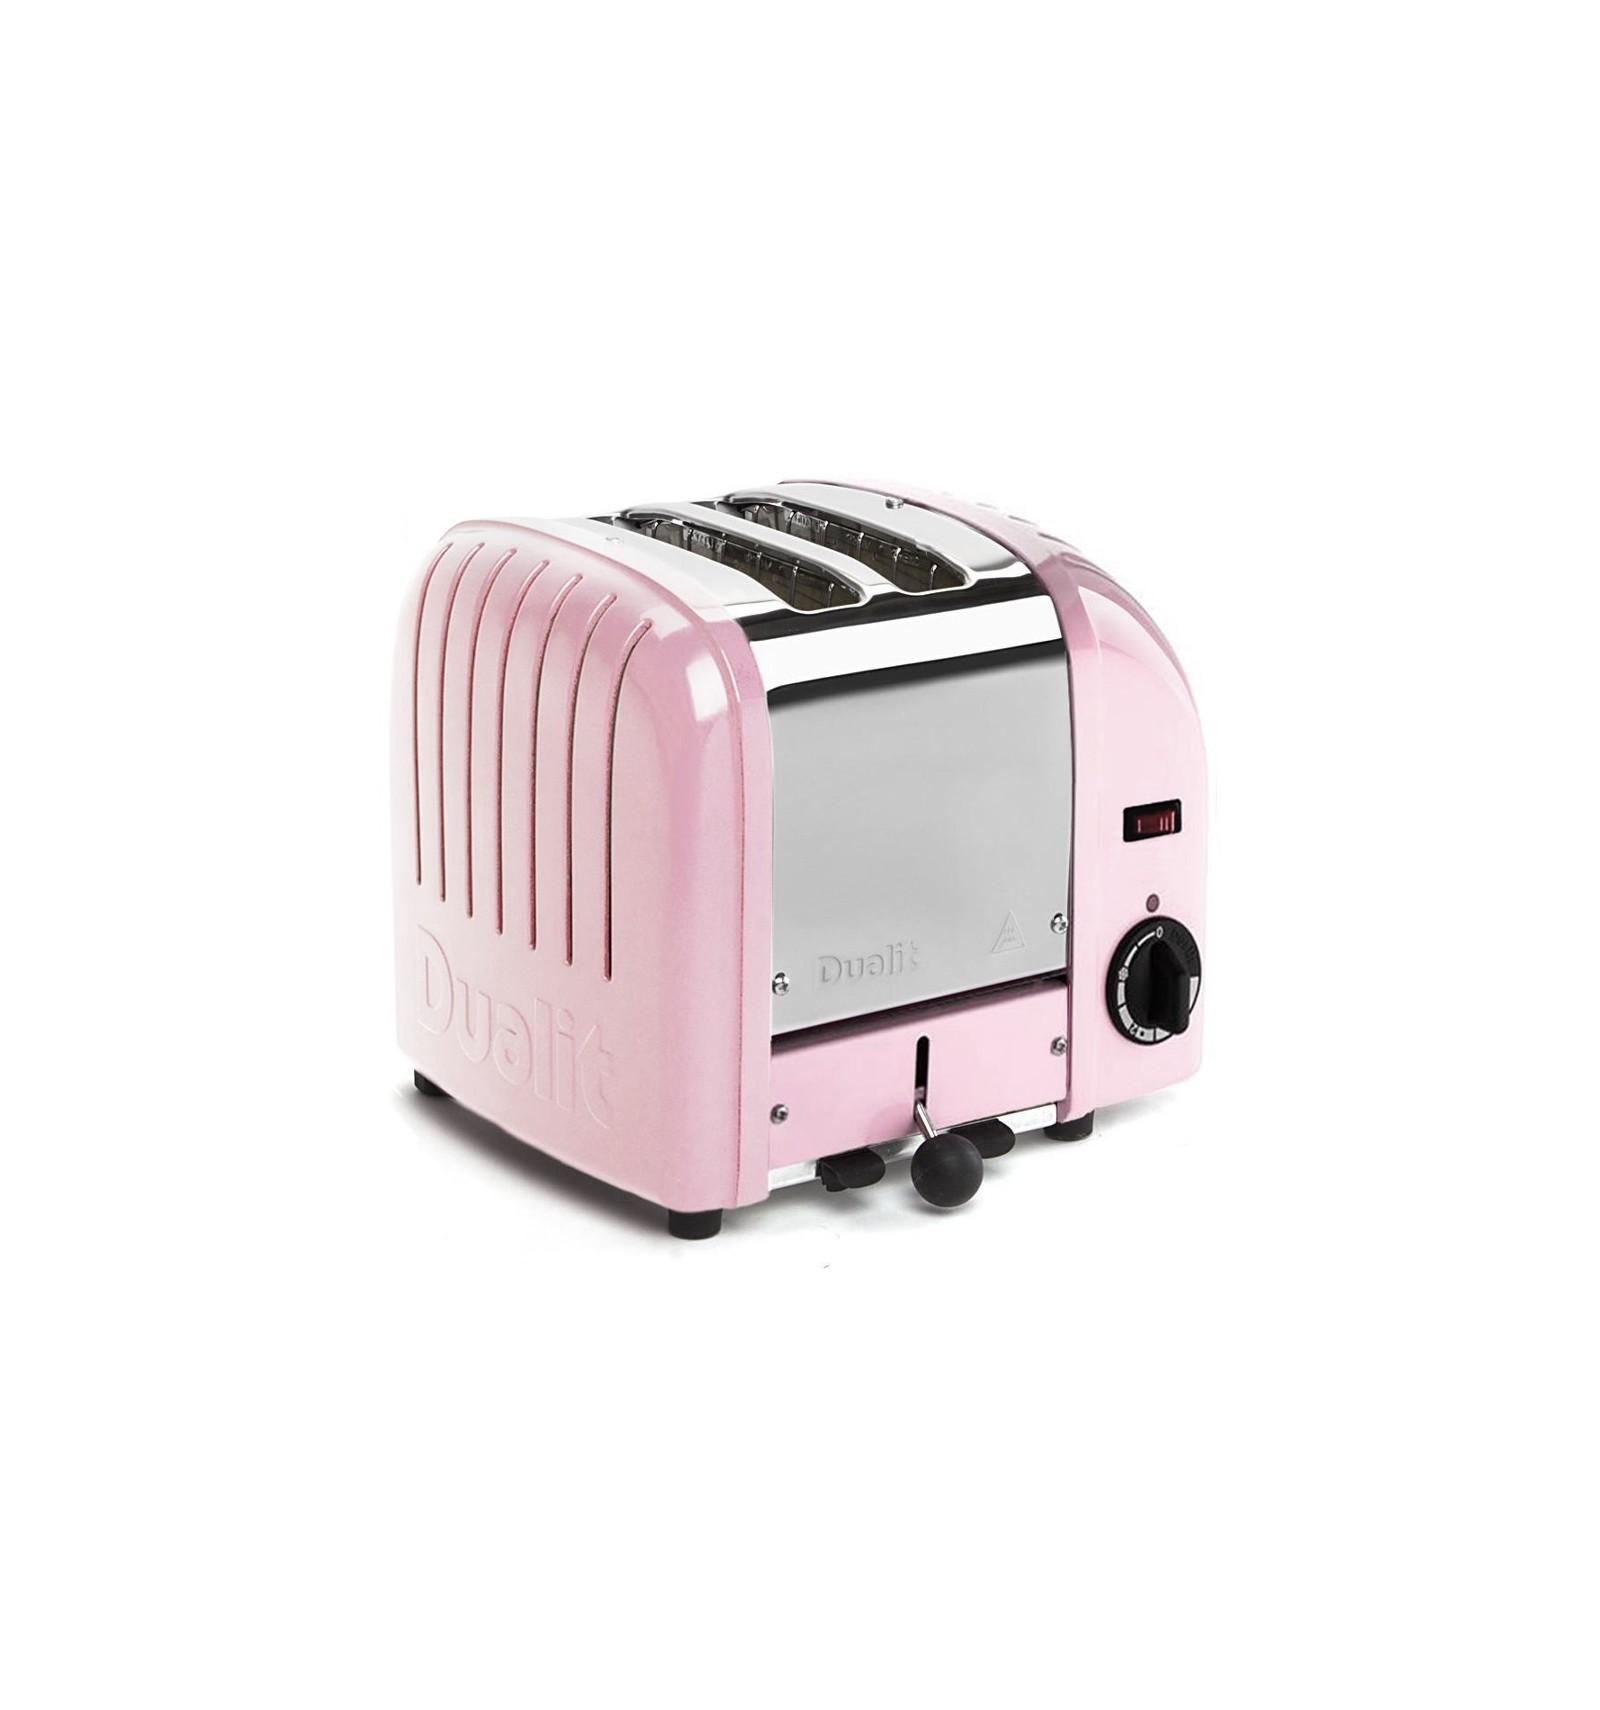 steel slice dualit stainless vario bread polished buy toaster